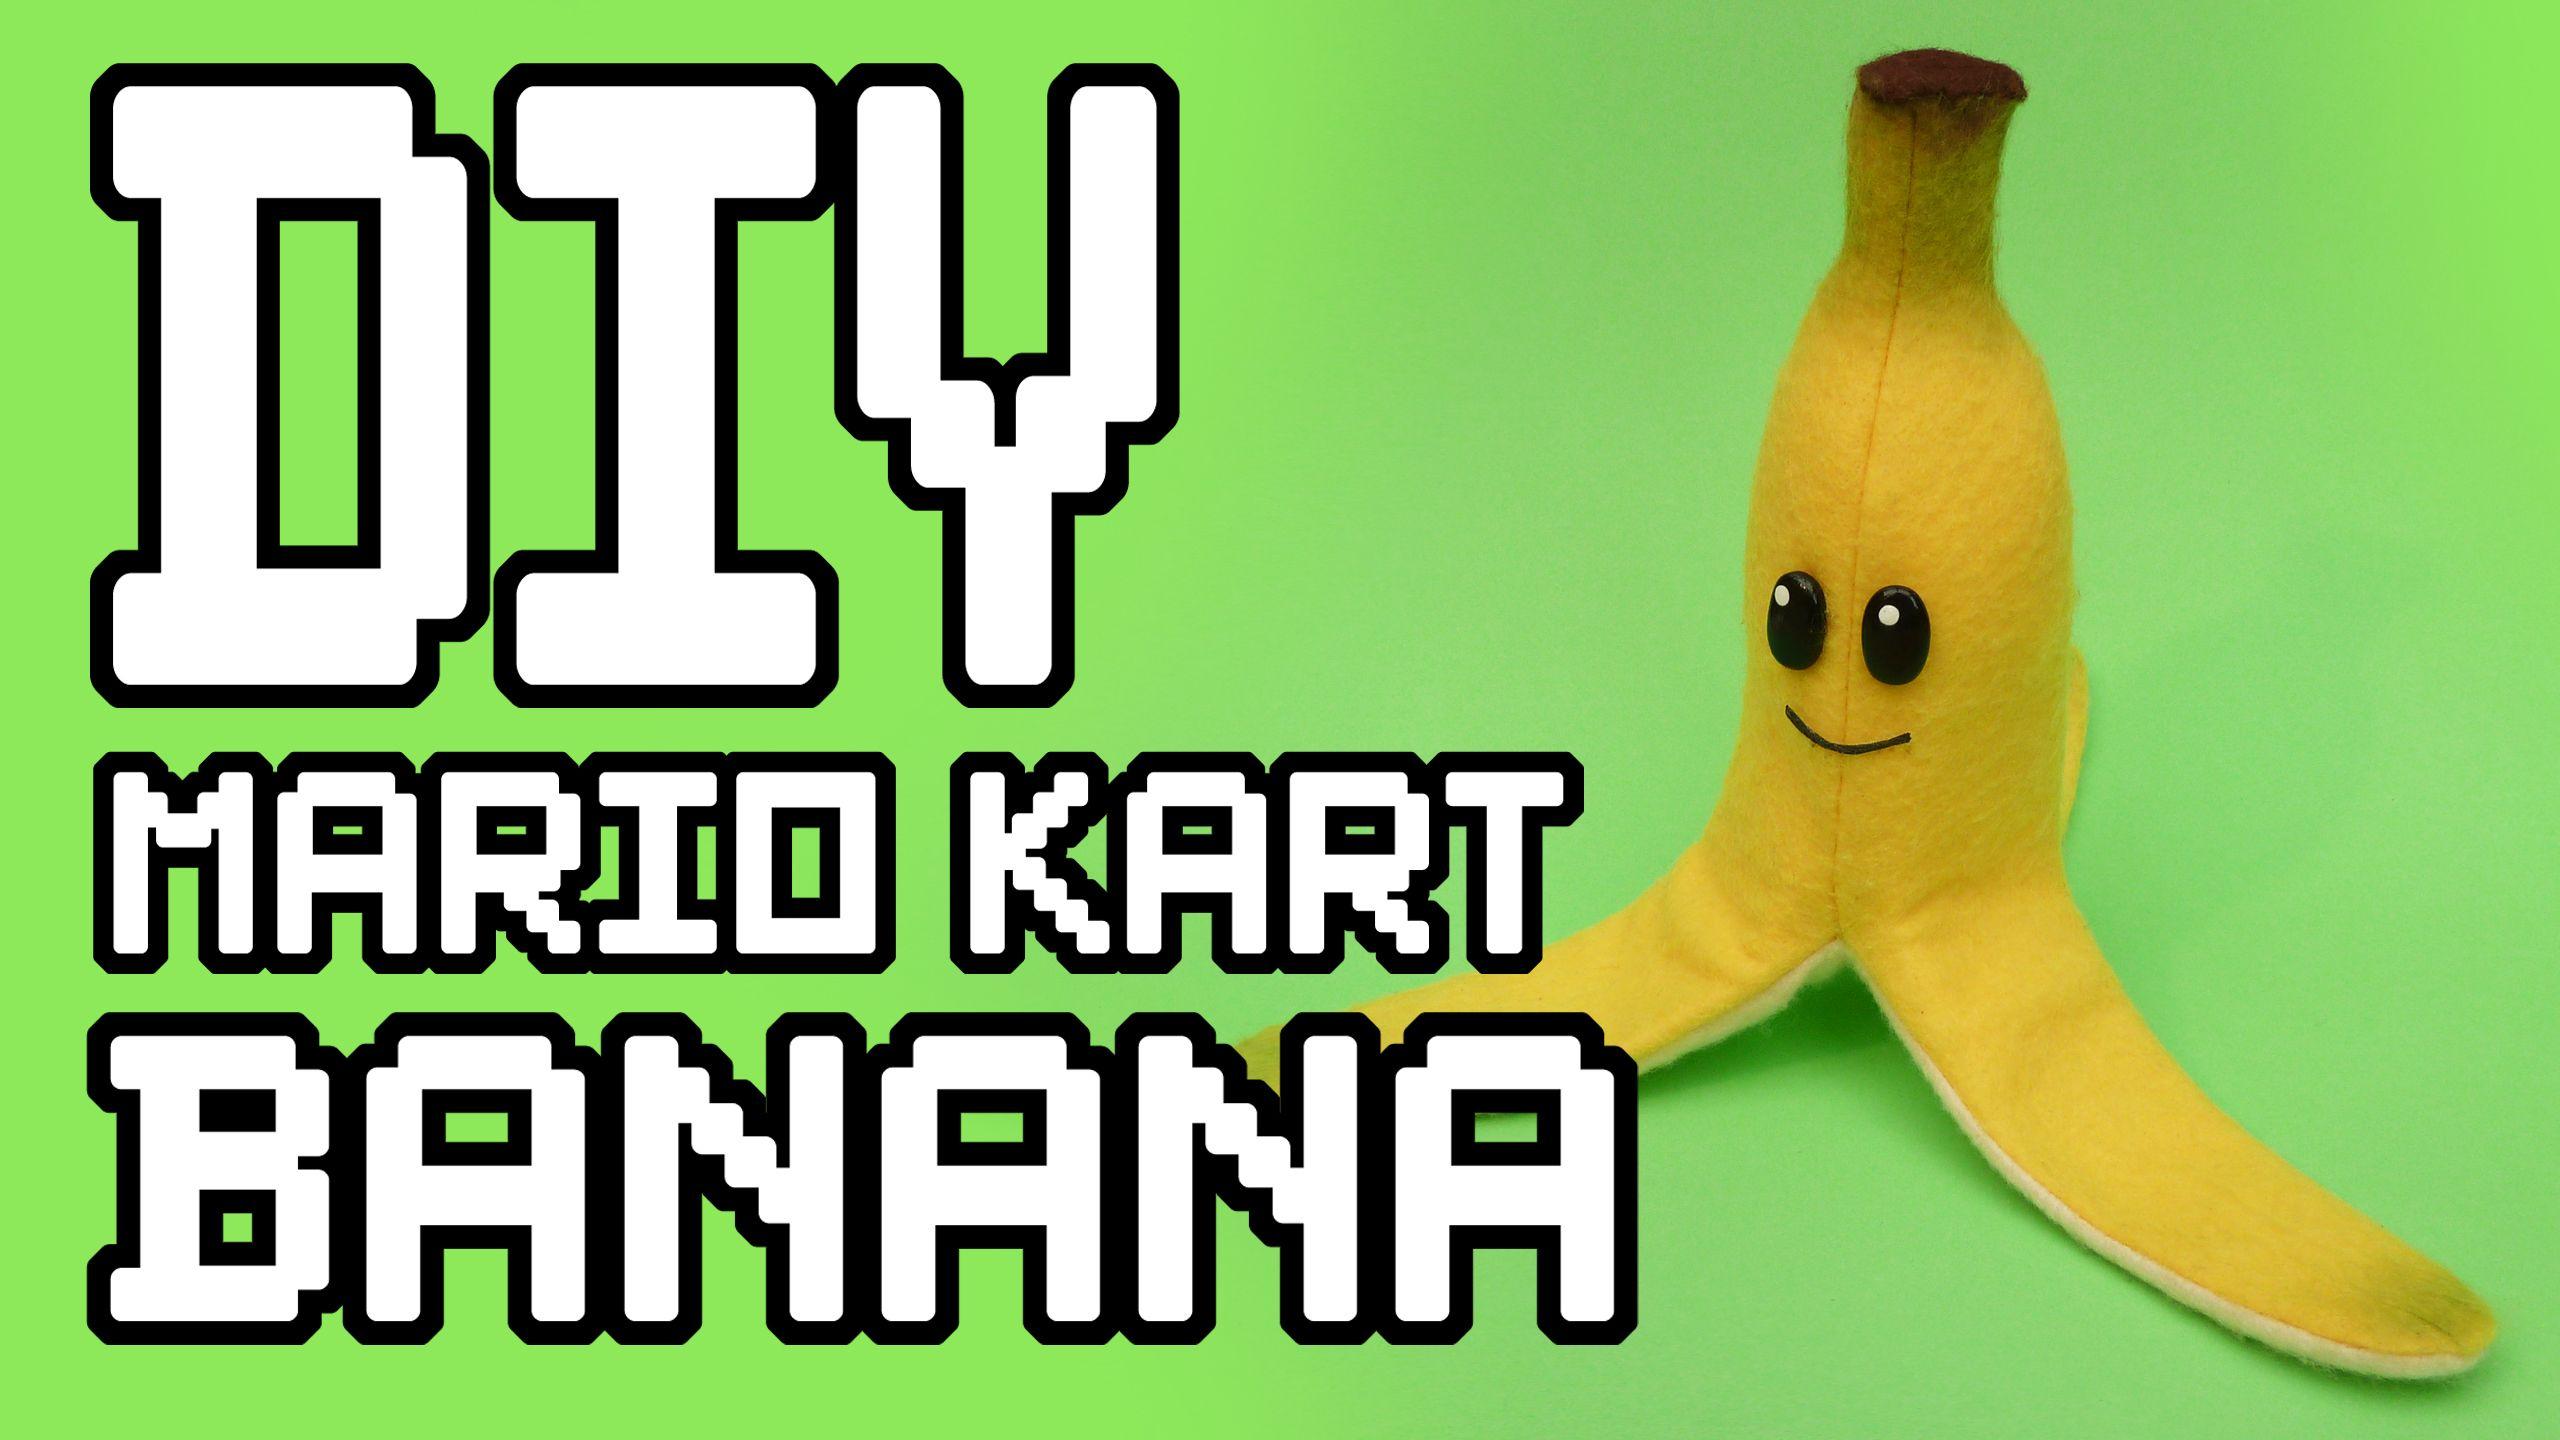 Mario kart banana plush diy this tutorial will teach you how to